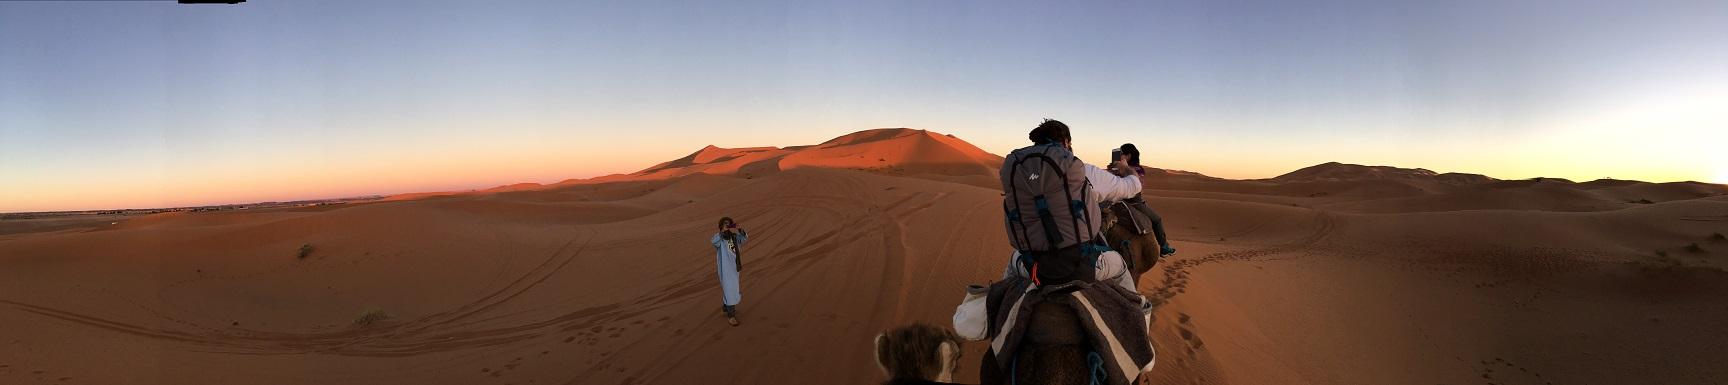 A gélida mas incrível noite no deserto do Marrocos